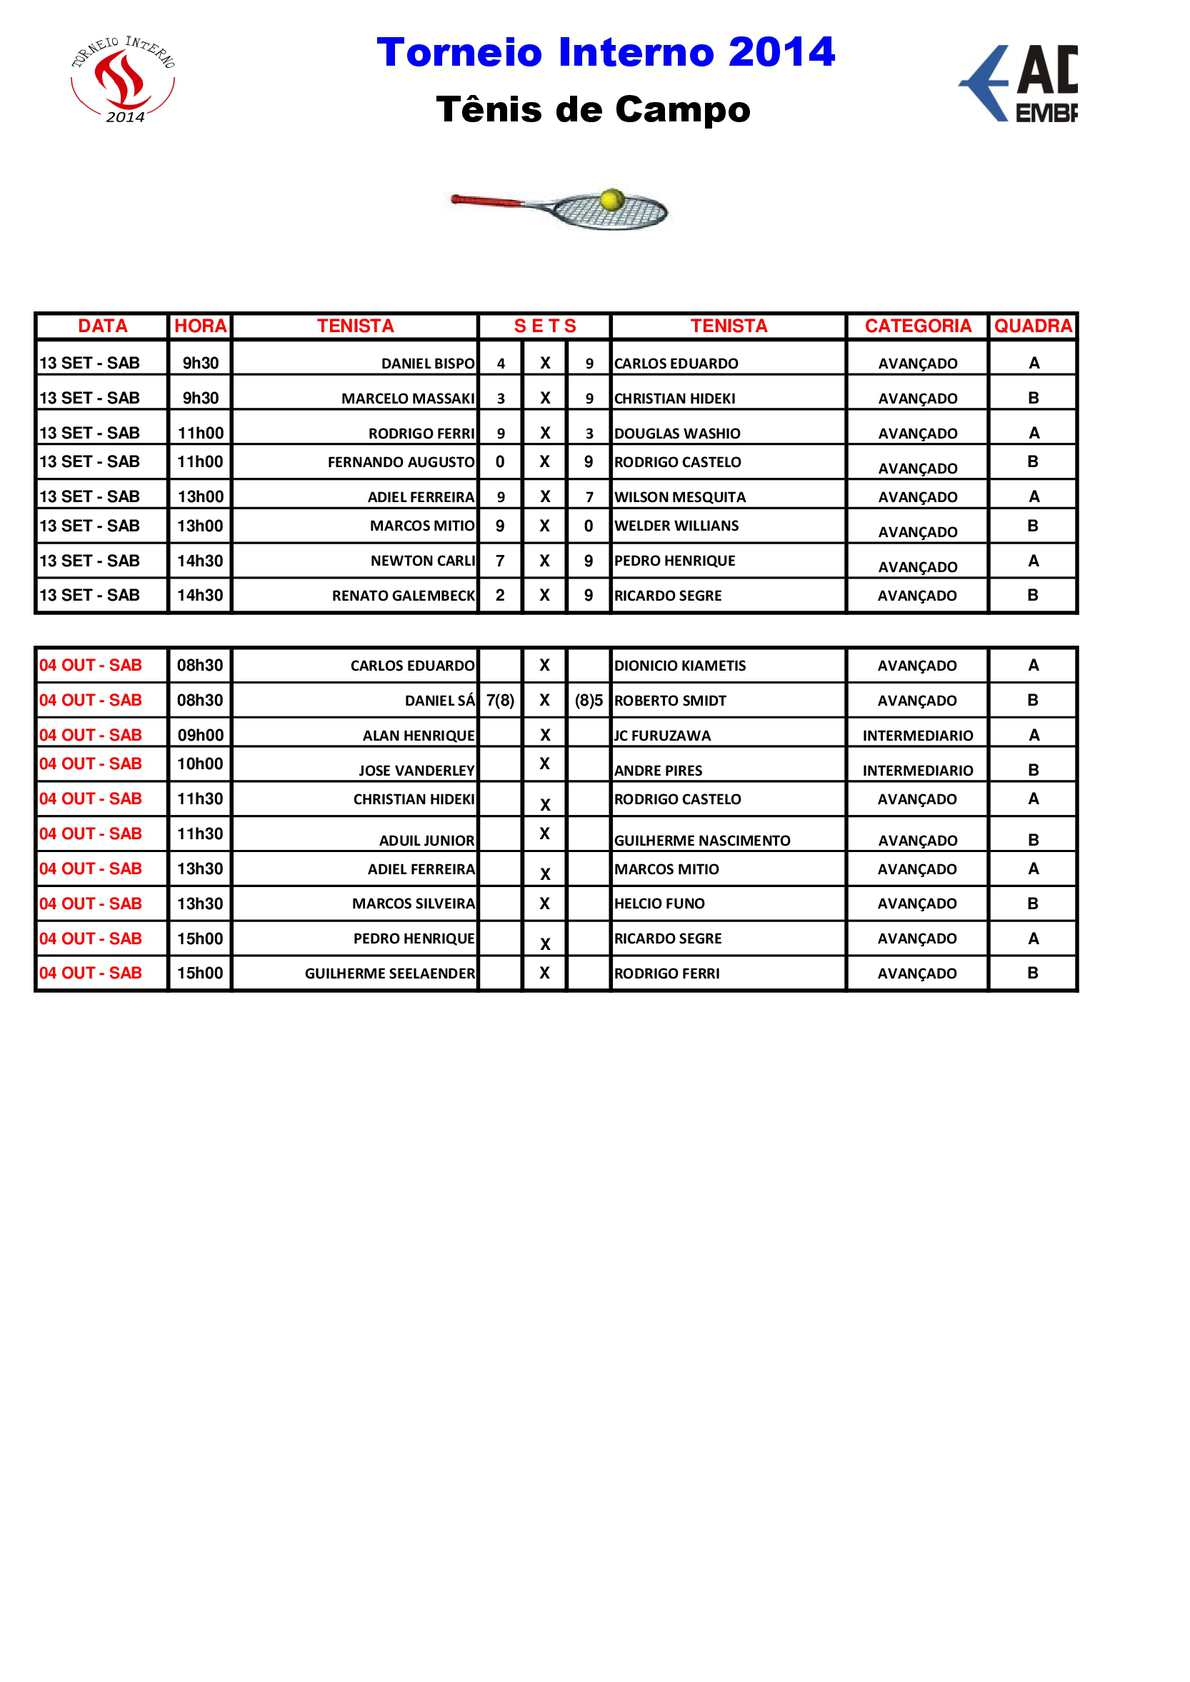 6336ba5ed54 Calaméo - Resultado Torneio Interno 2014 Tênis